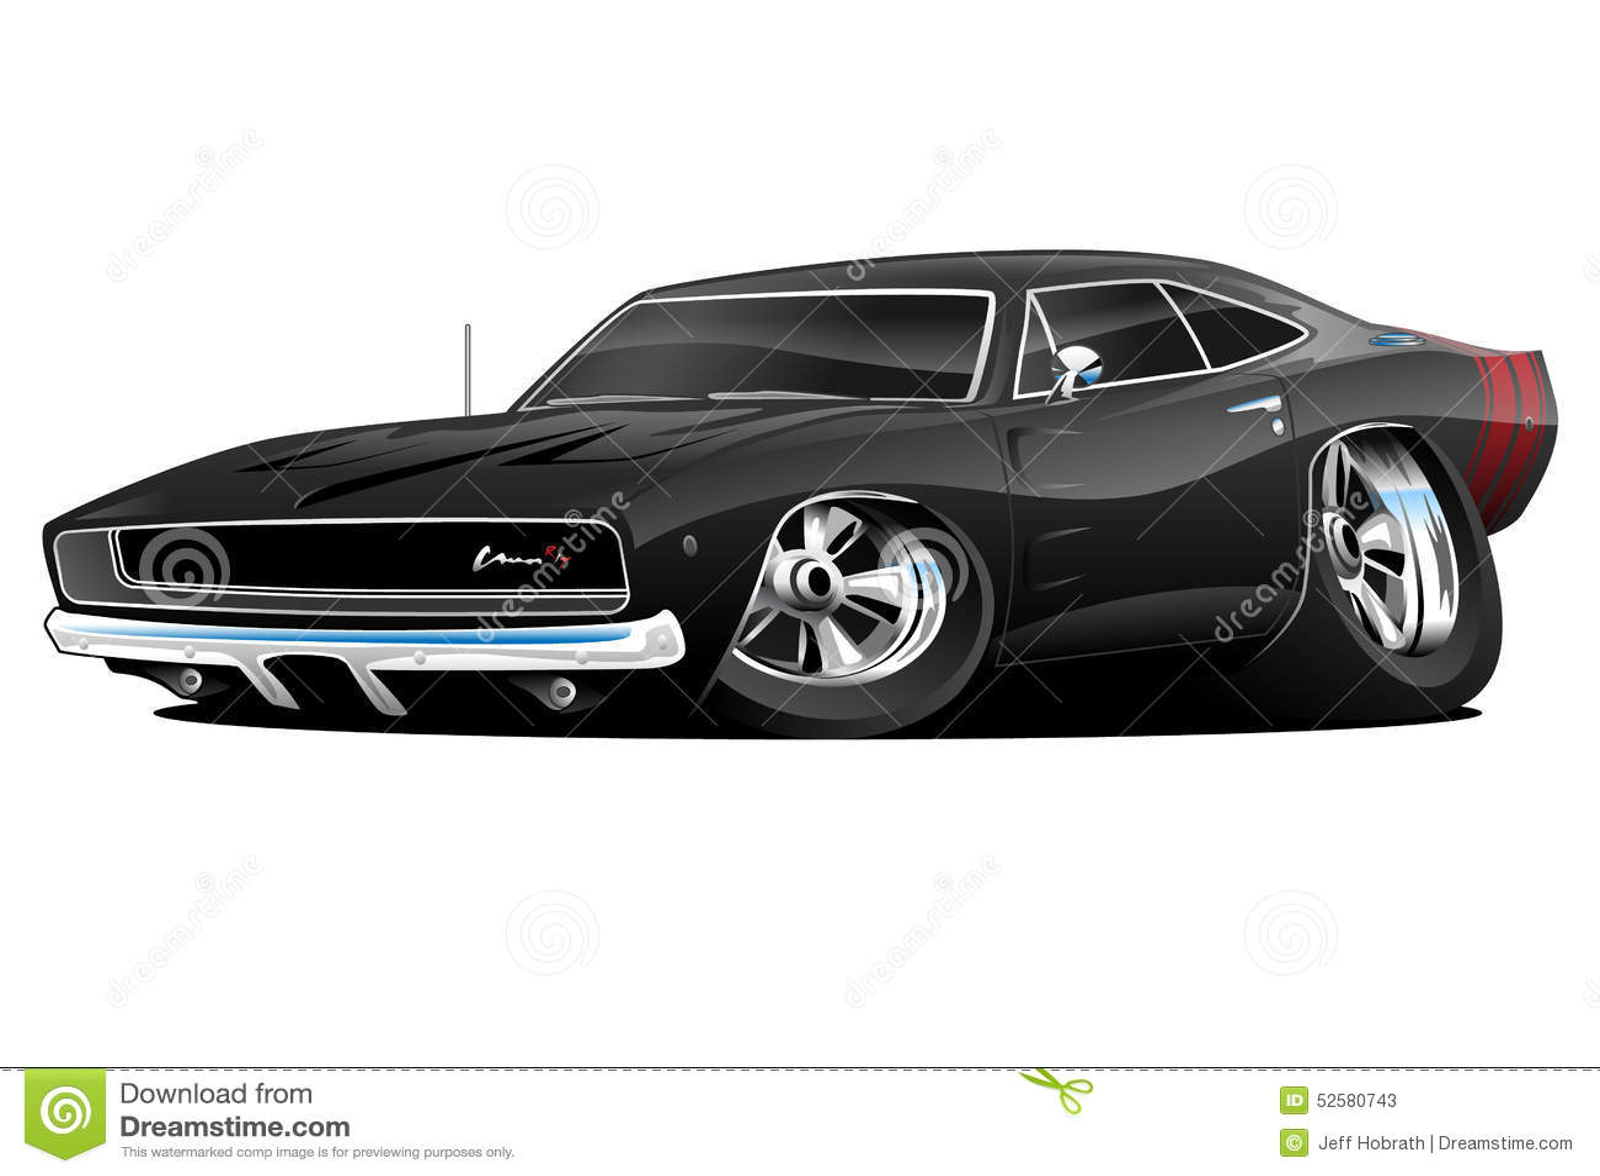 68 Muskel-Auto des Ladegerät-R/T